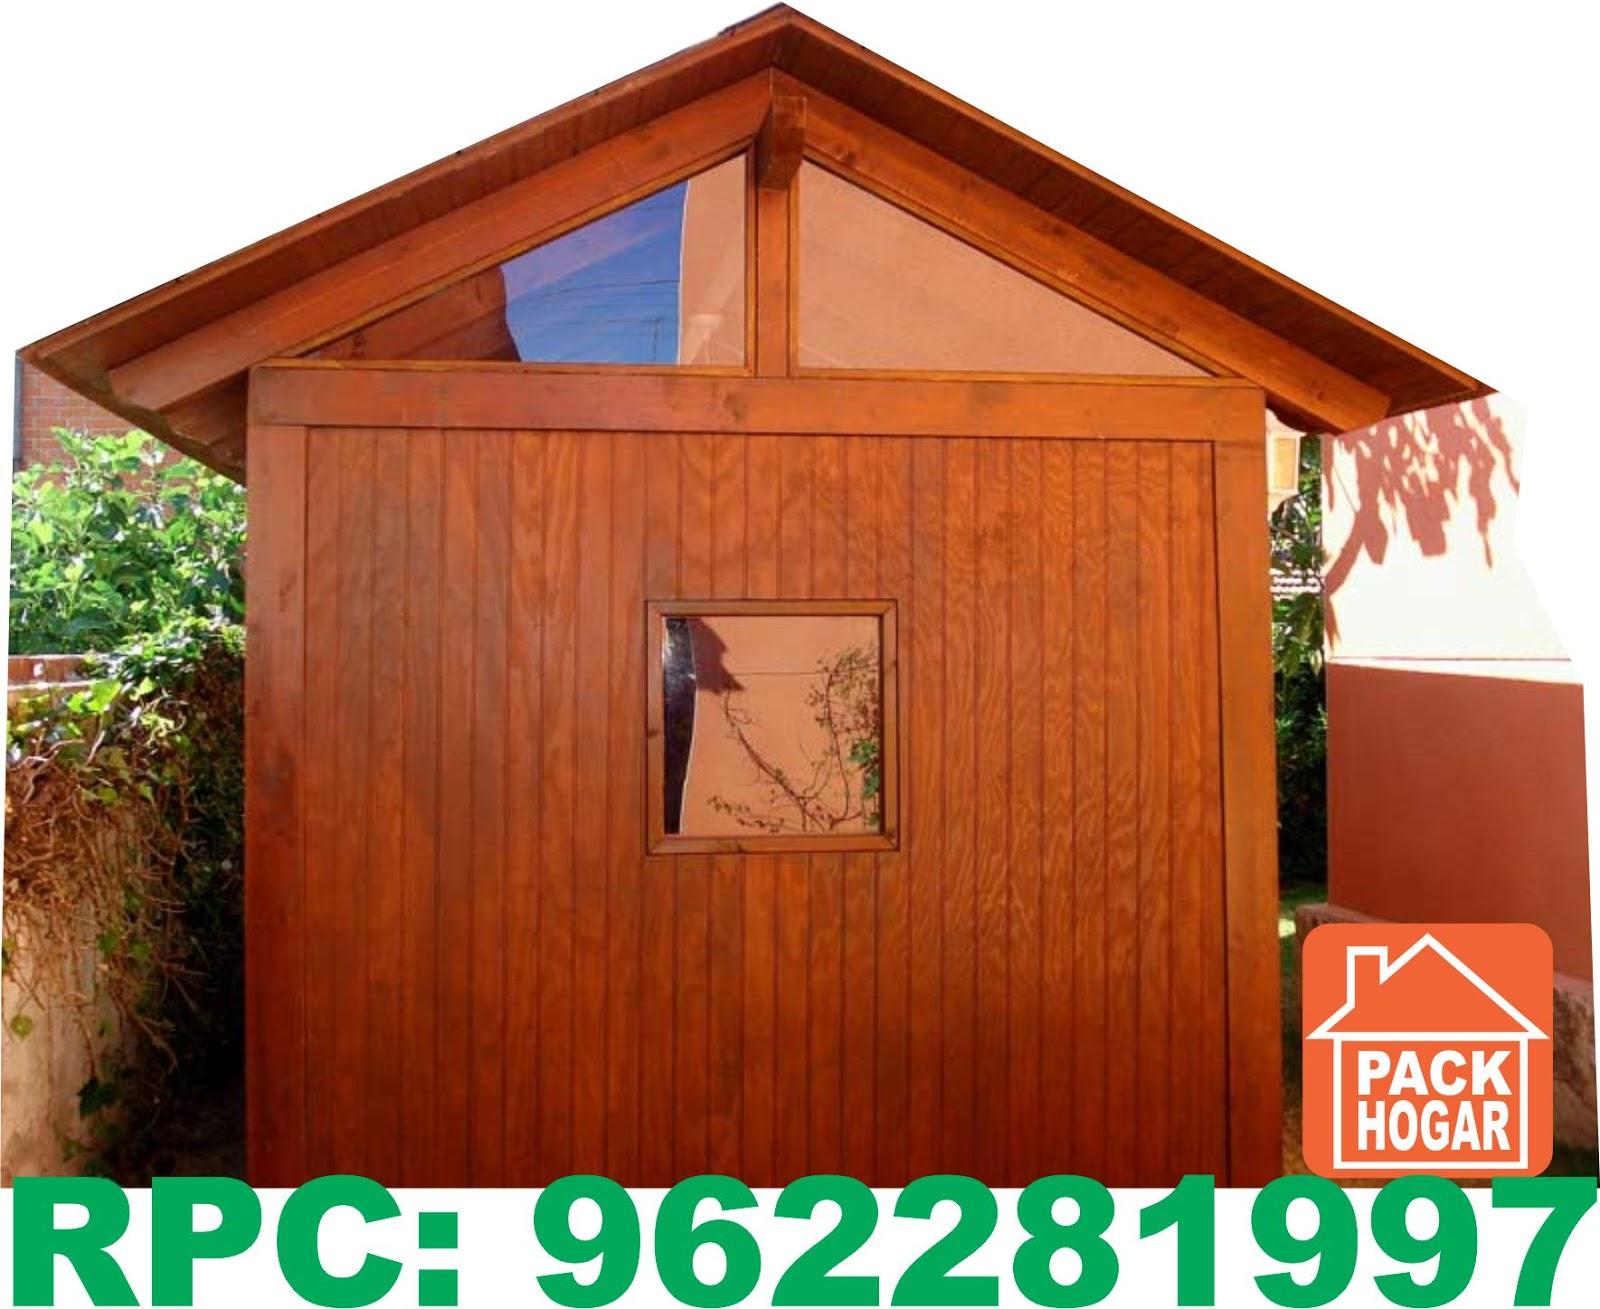 Casetas cuartos habitables prefabricadas de madera lima for Casetas madera jardin